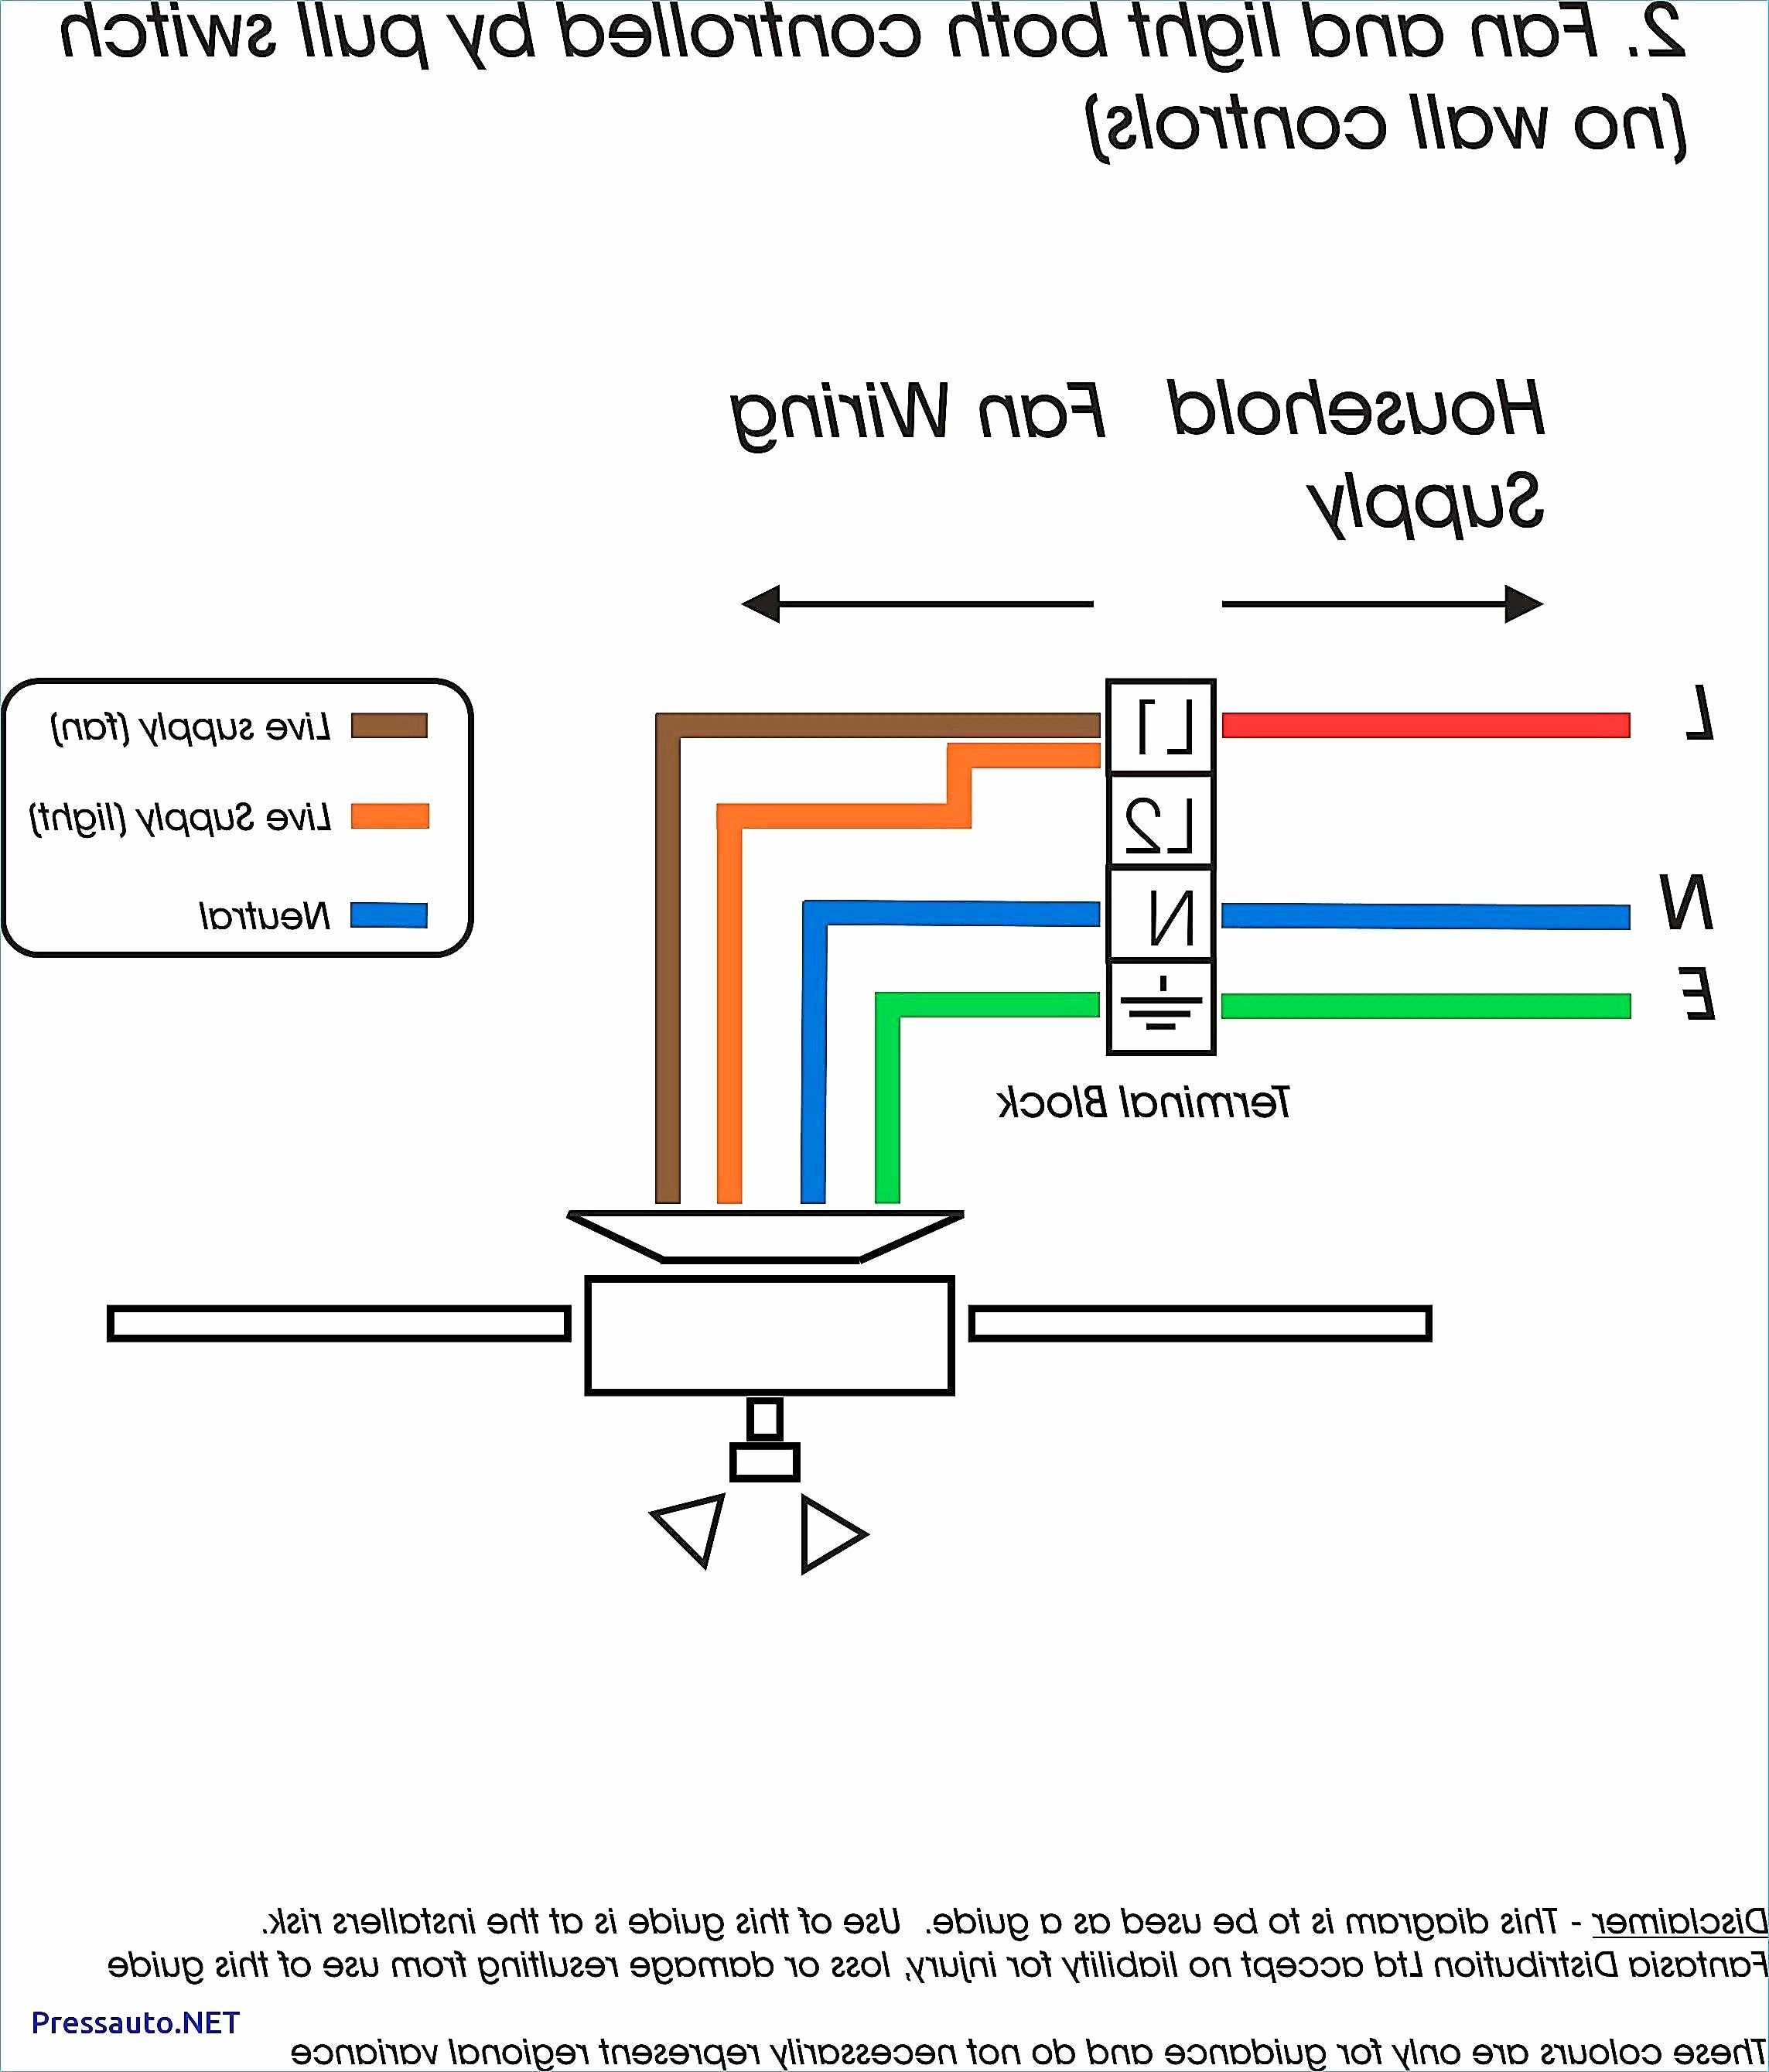 Garage Door Opener Parts Diagram Liftmaster Professional Wiring Diagram Wiring Diagrams Lol Of Garage Door Opener Parts Diagram